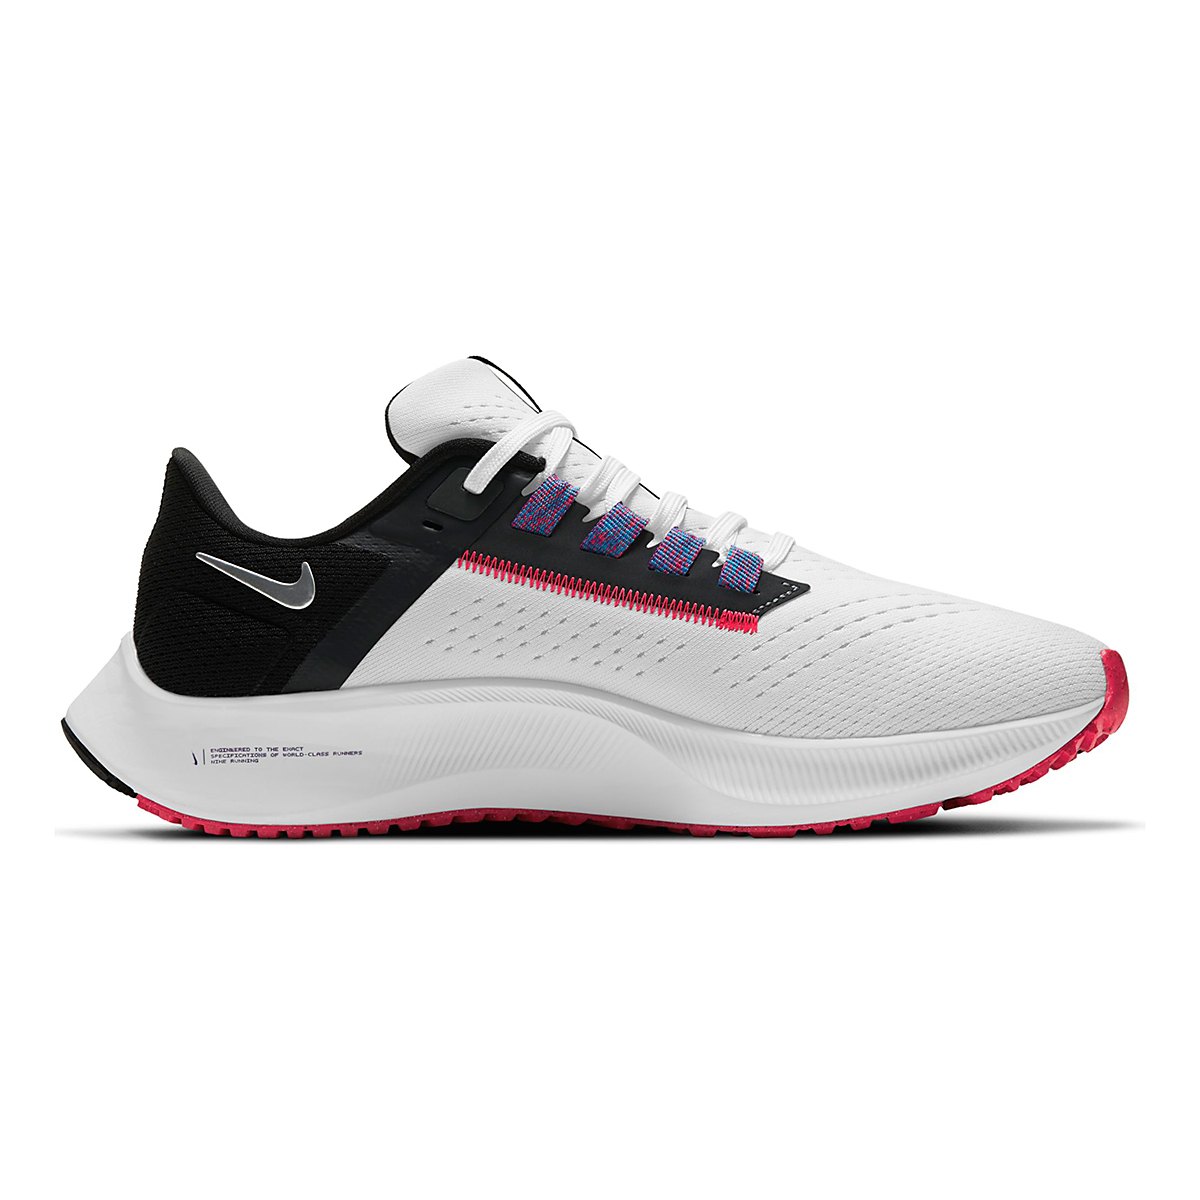 Women's Nike Air Zoom Pegasus 38 Running Shoe - Color: White/Metallic Silver/Black - Size: 5 - Width: Regular, White/Metallic Silver/Black, large, image 1